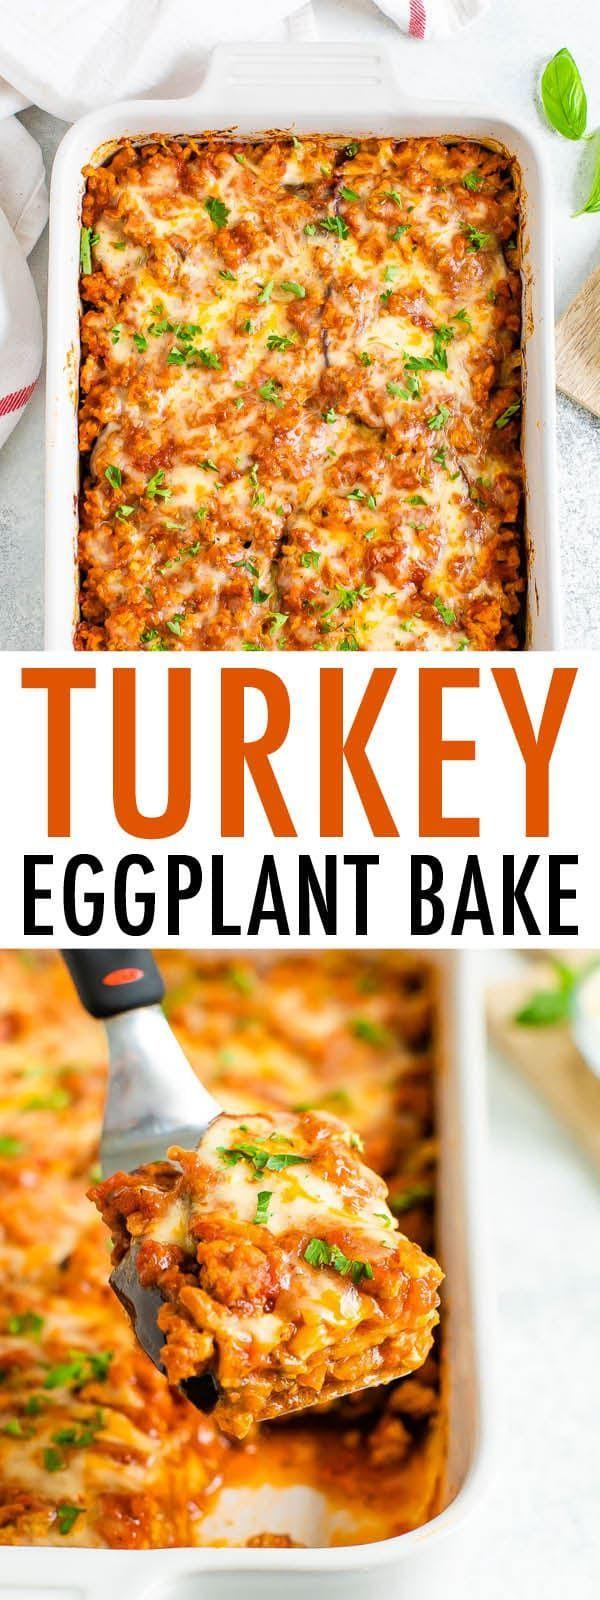 Cheesy Eggplant Casserole with Ground Turkey | Eating Bird Food